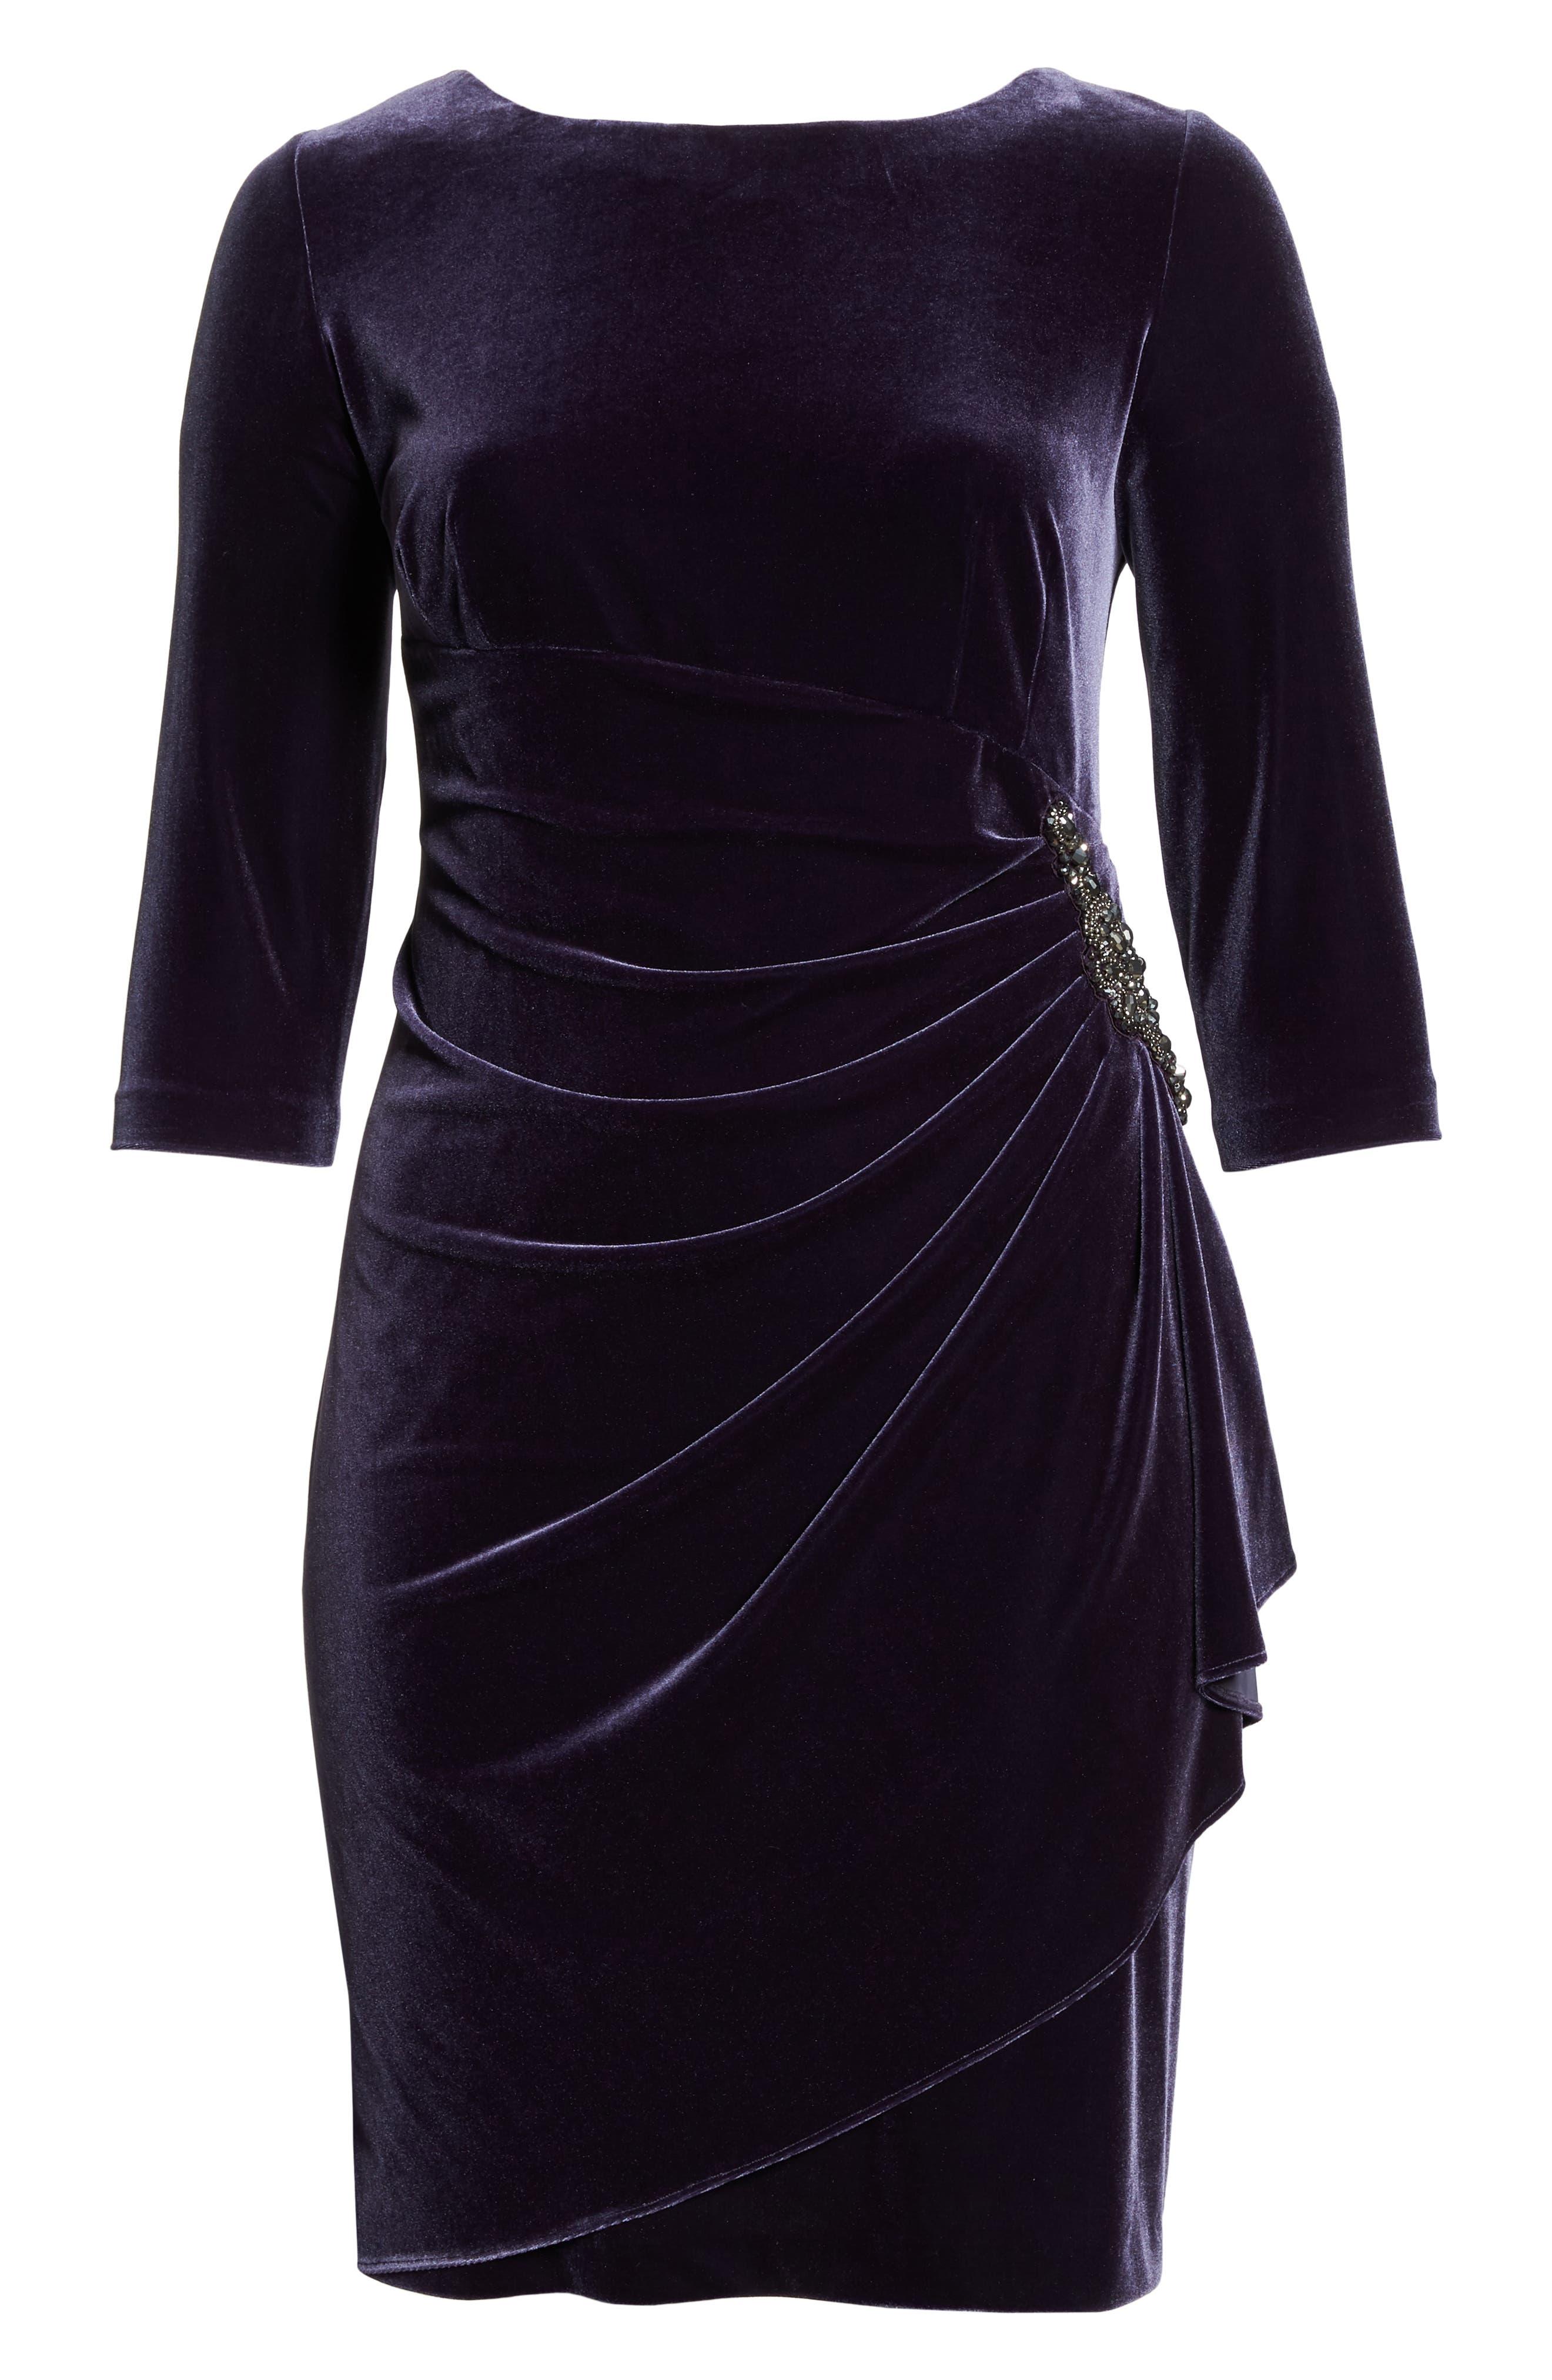 Alex Evening Velvet Sheath Dress,                             Alternate thumbnail 7, color,                             AMETHYST